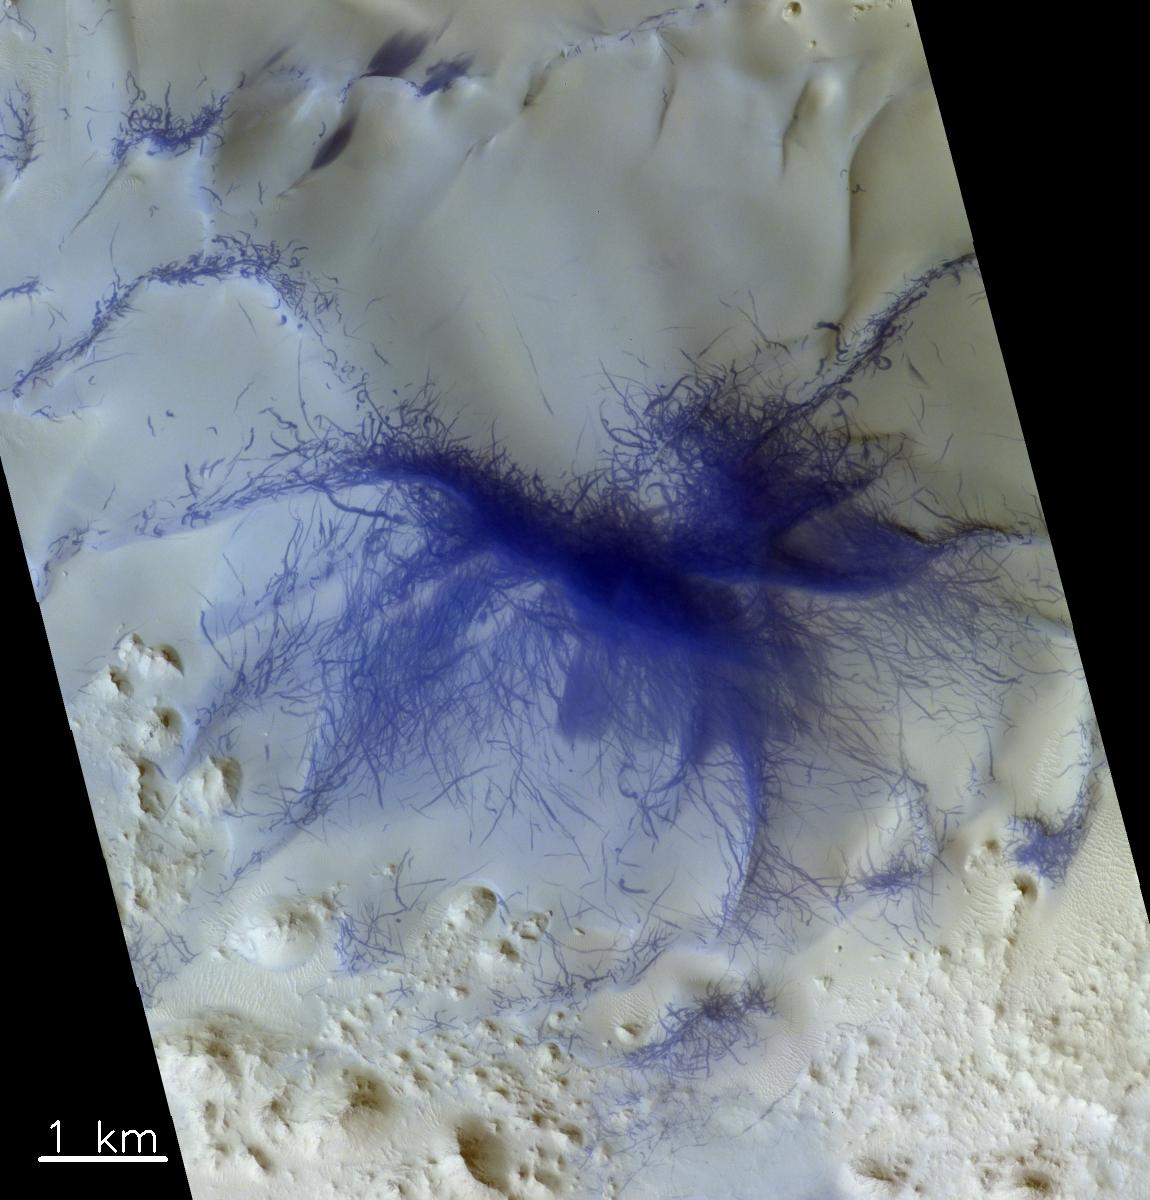 photo:ESA/Roscosmos/CaSSIS;licence:cc